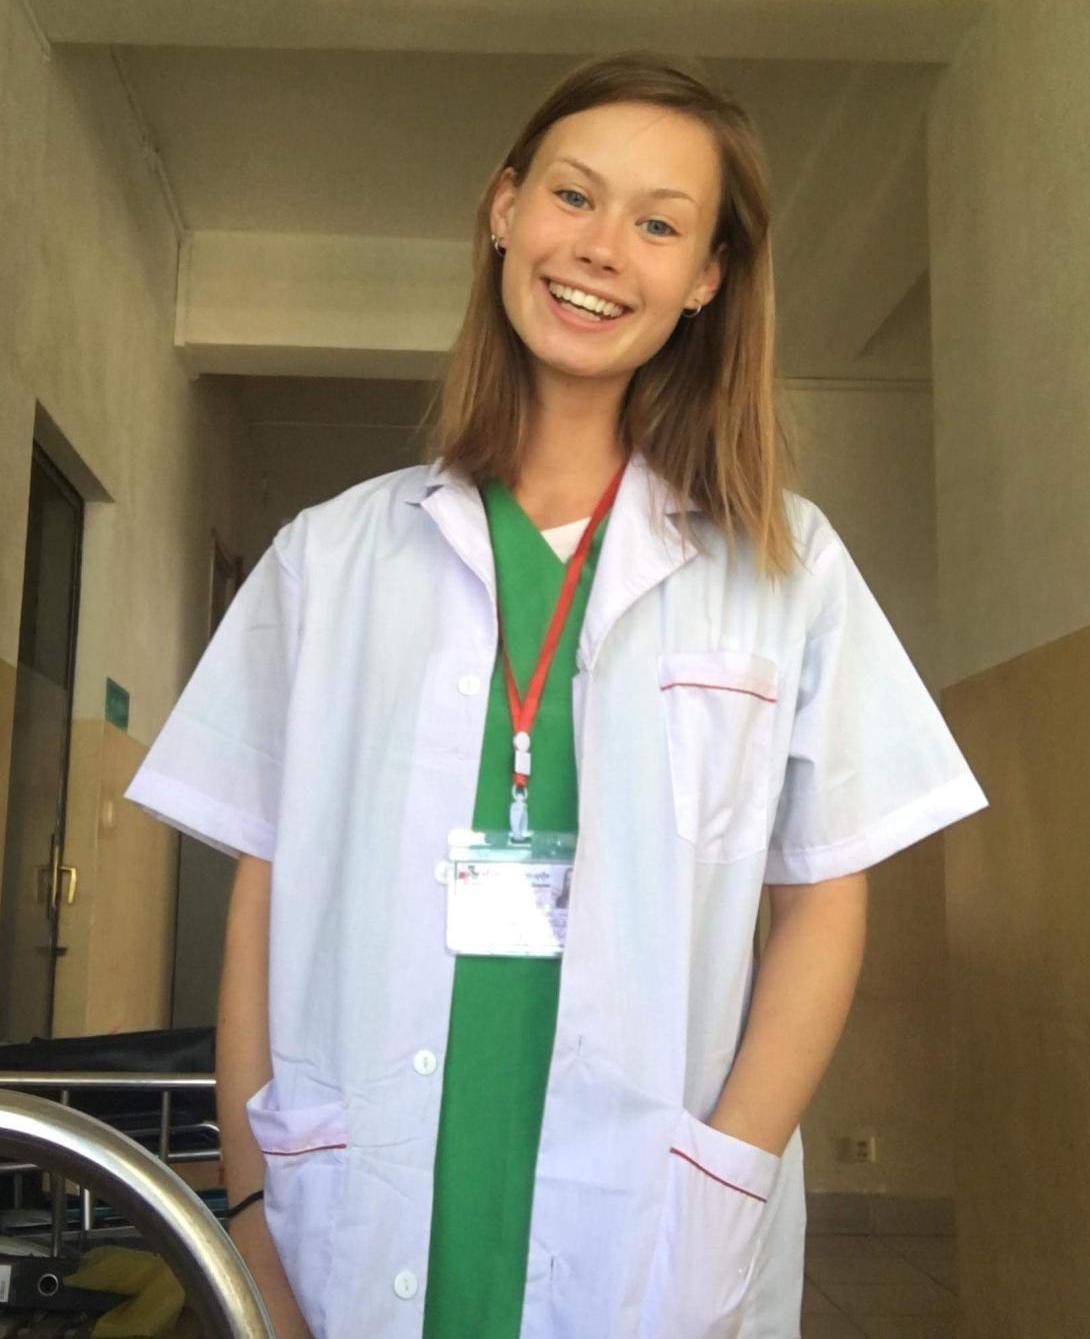 A medical volunteer smiles during her international internship in Cambodia